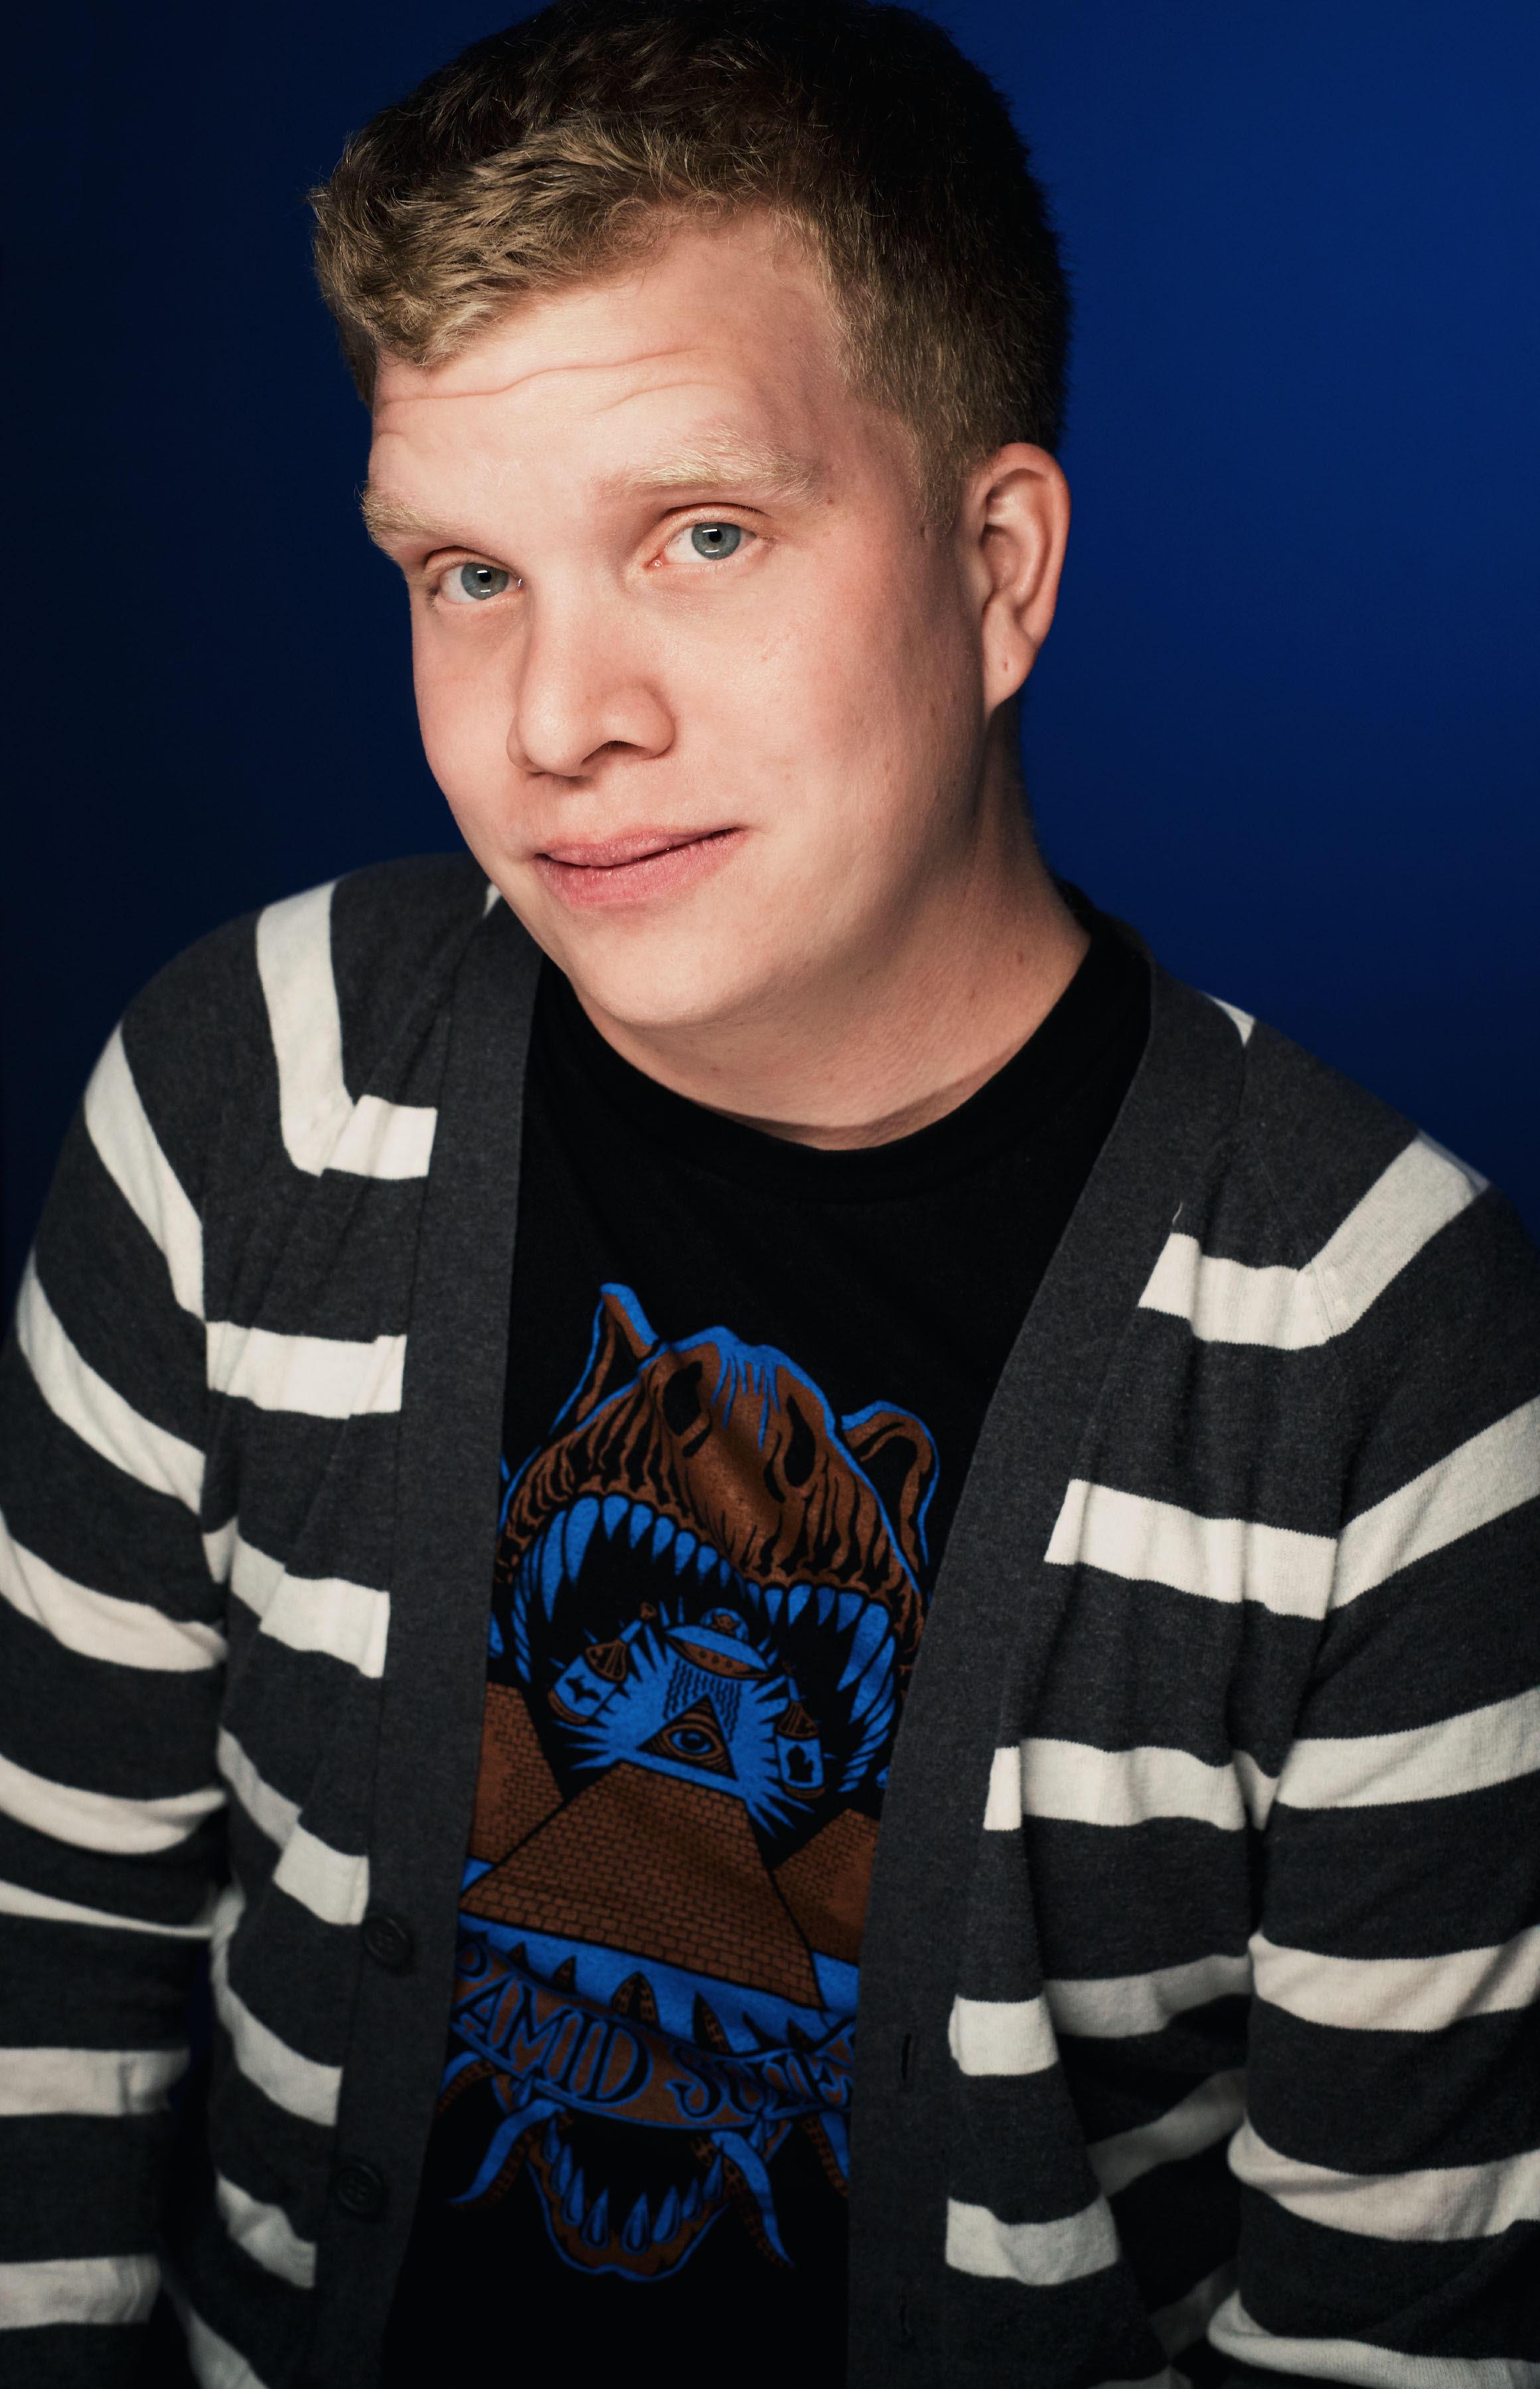 Stand-up comedian Josh Florhaug